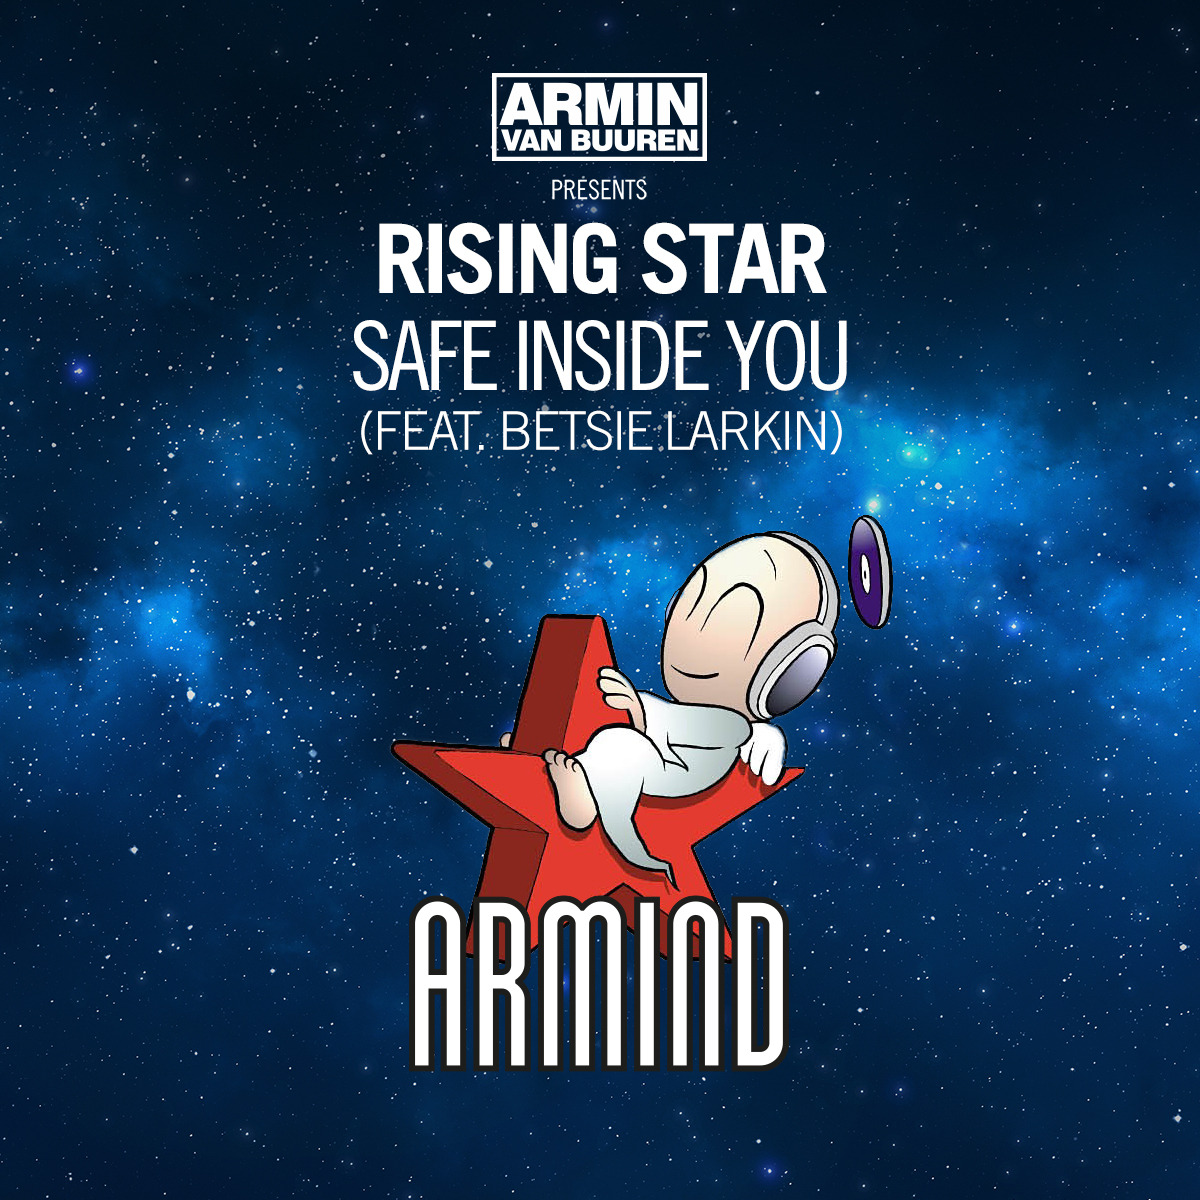 Armin van Buuren pres. Rising Star - Safe Inside You